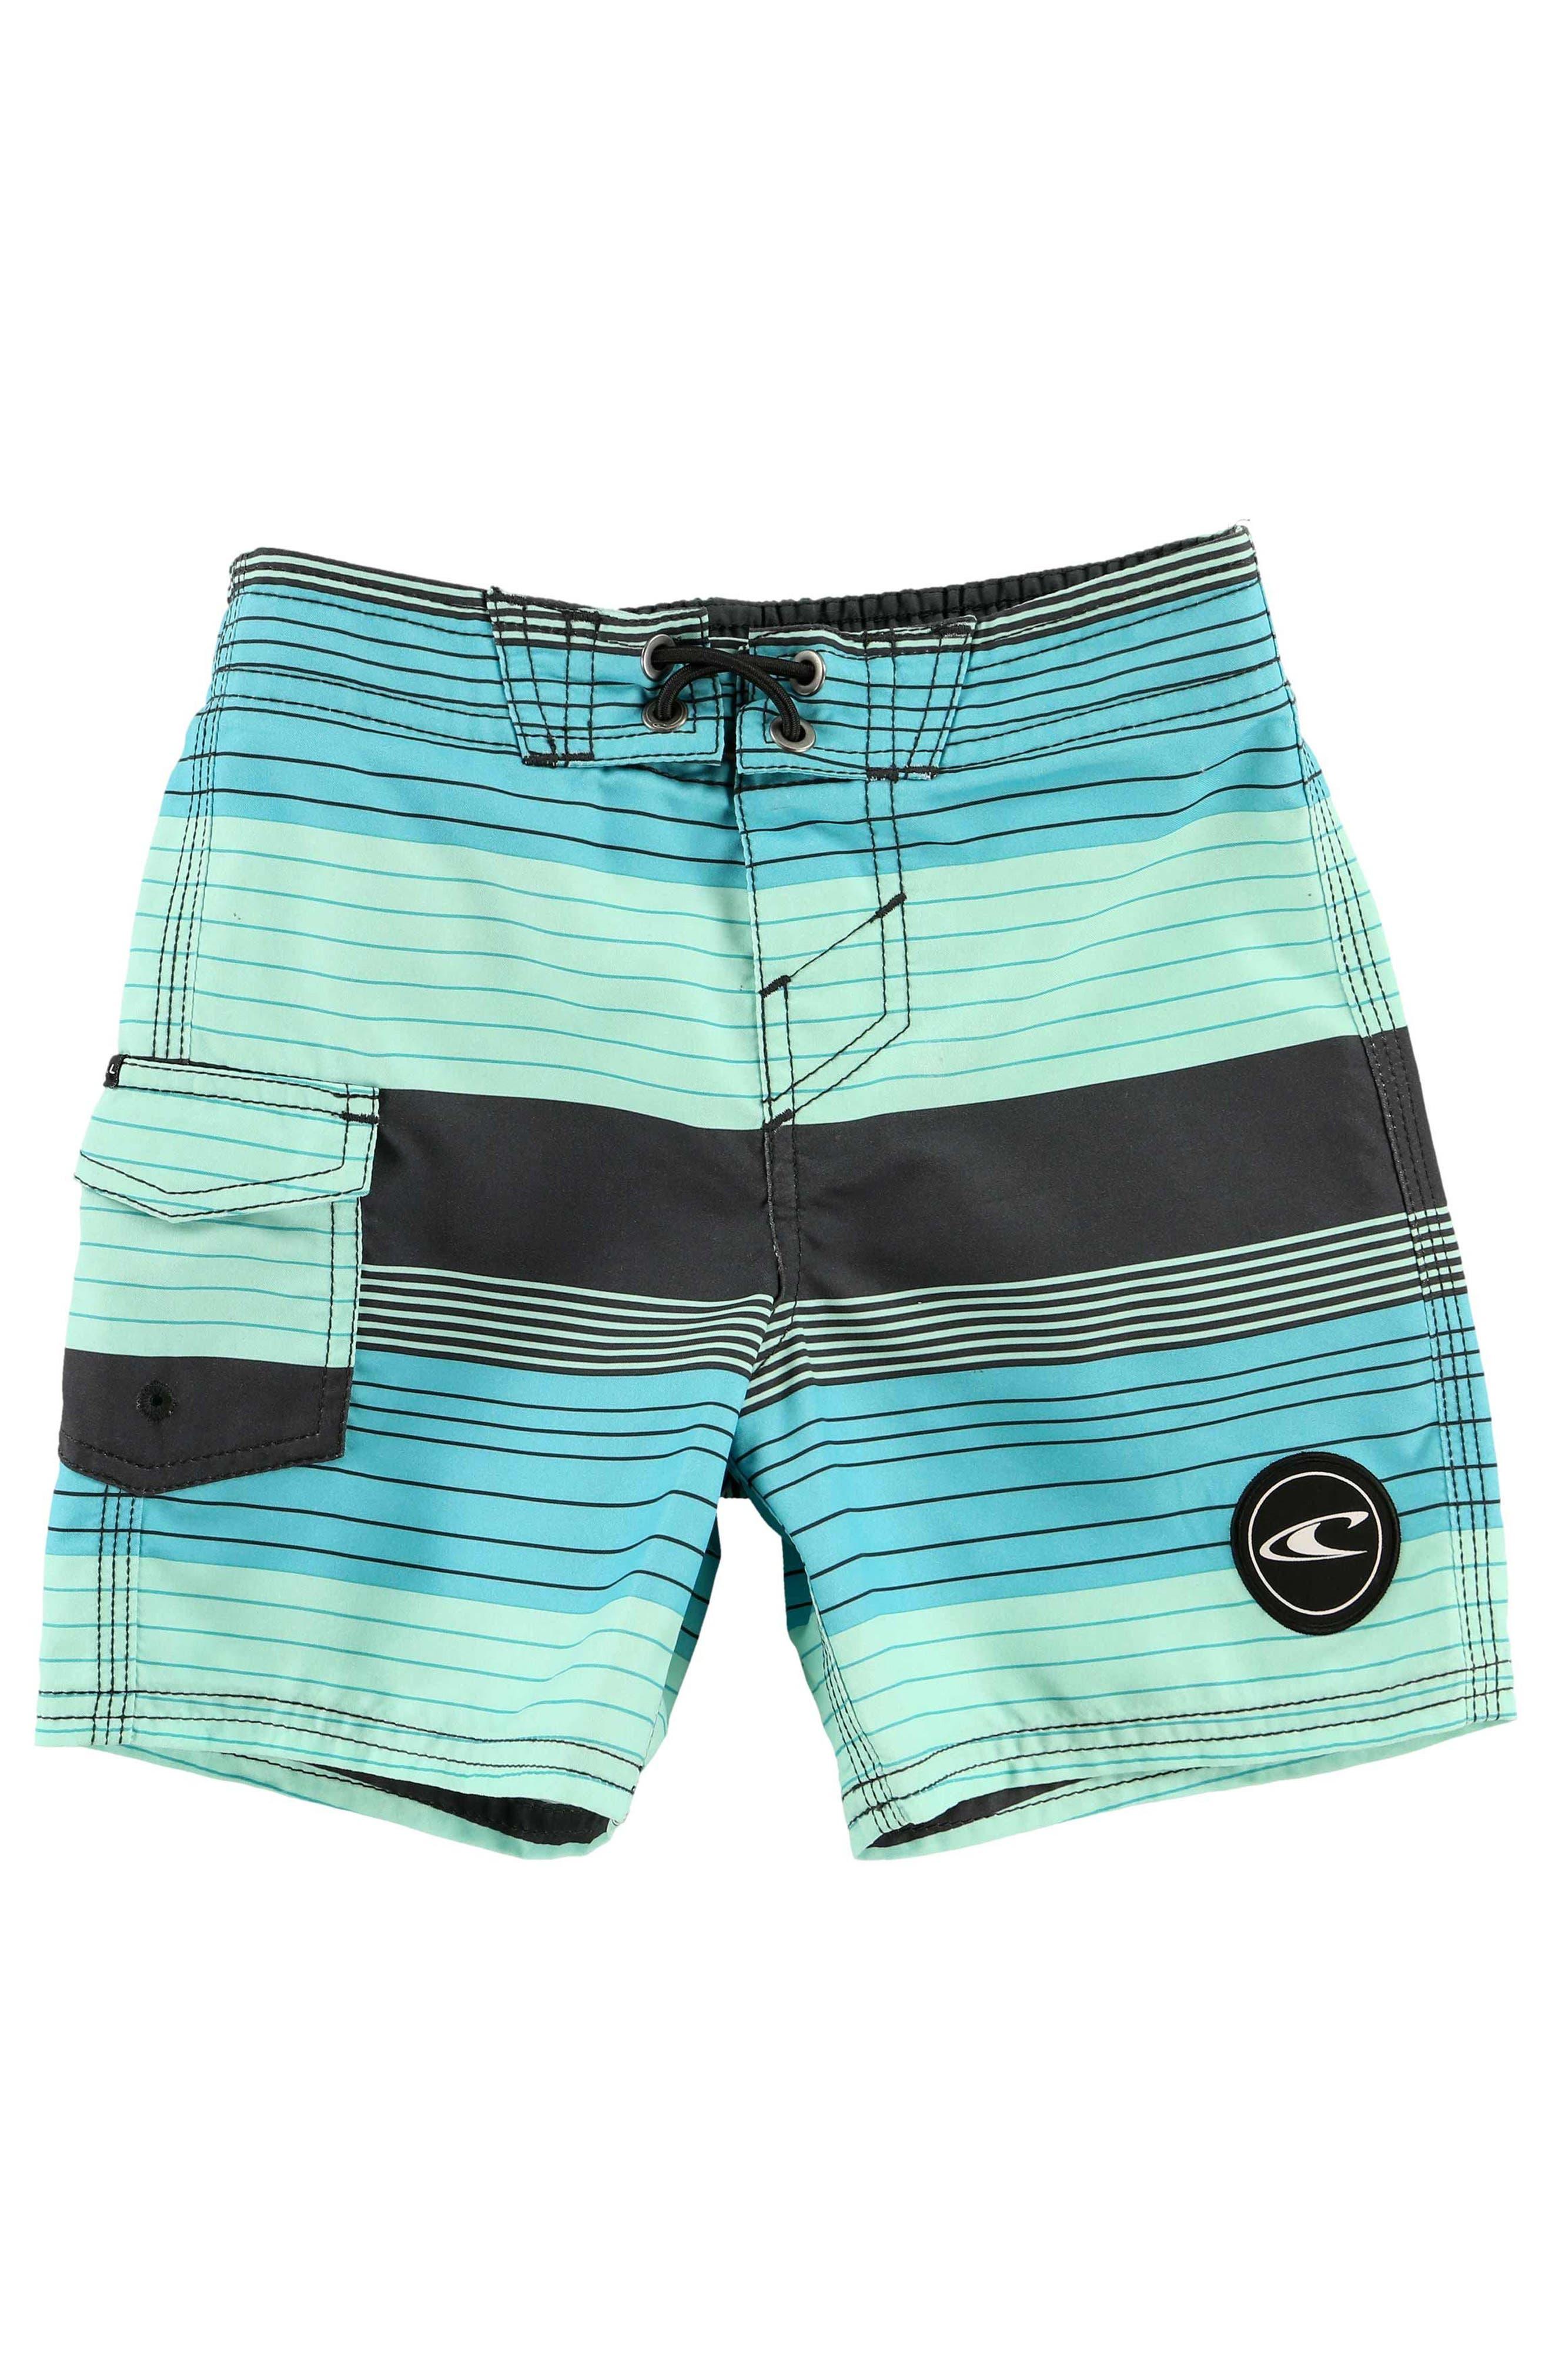 Santa Cruz Stripe Board Shorts,                         Main,                         color, Aqua